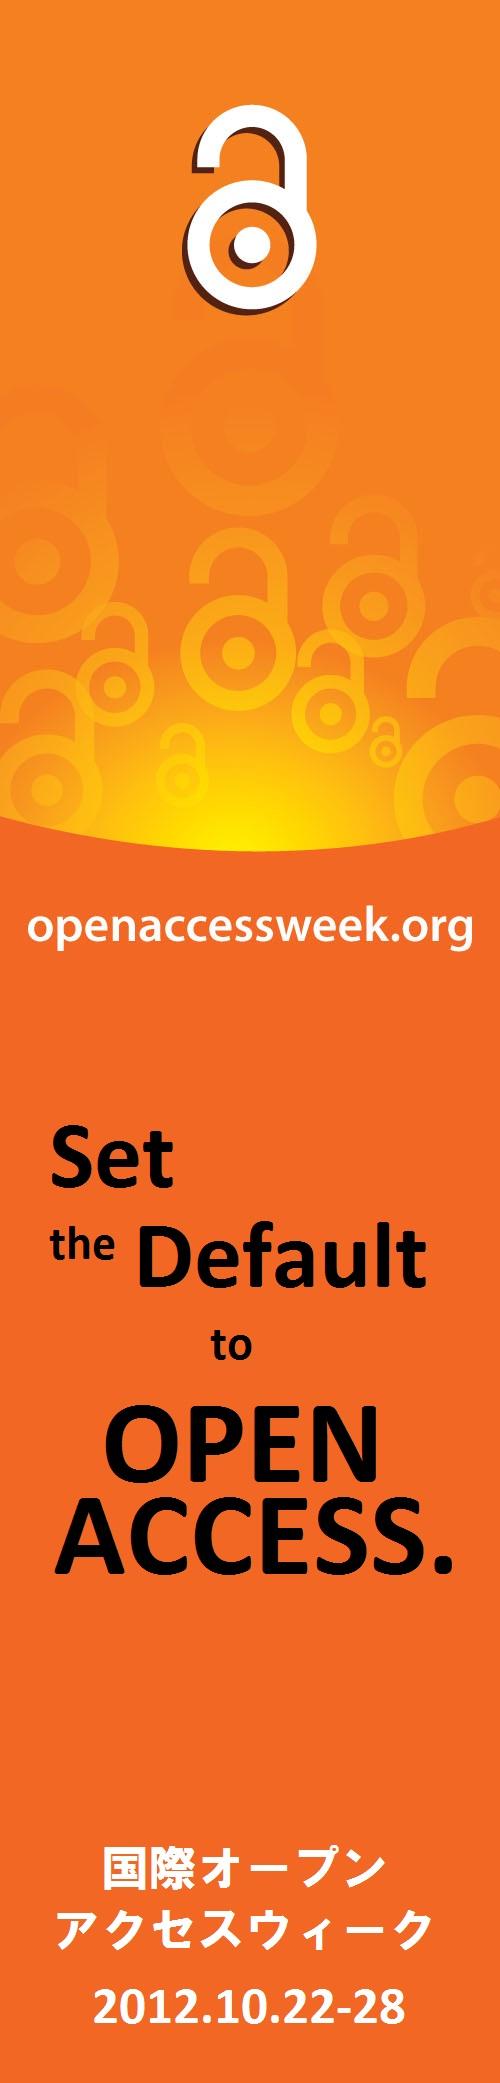 Open Access Week 2012 in Japan_bookmark